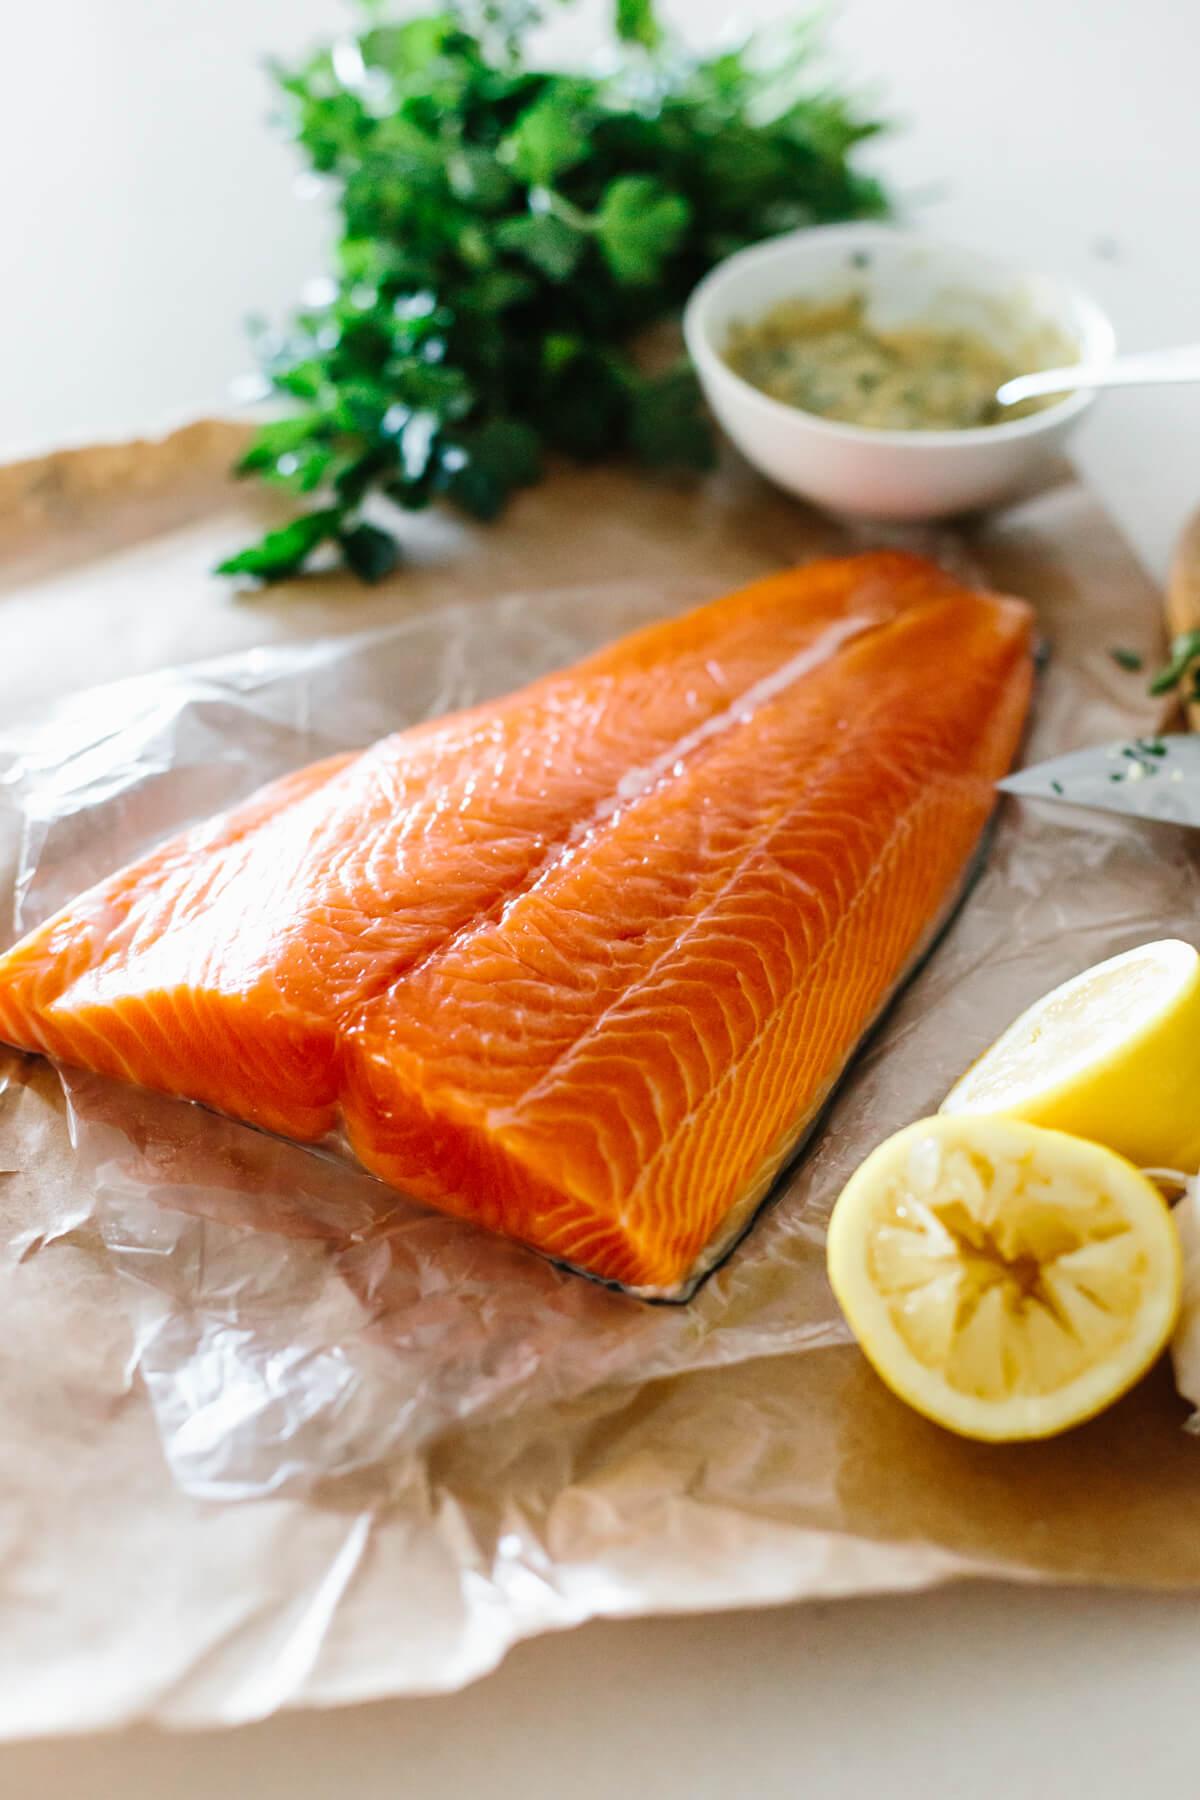 A salmon fillet for dijon baked salmon.